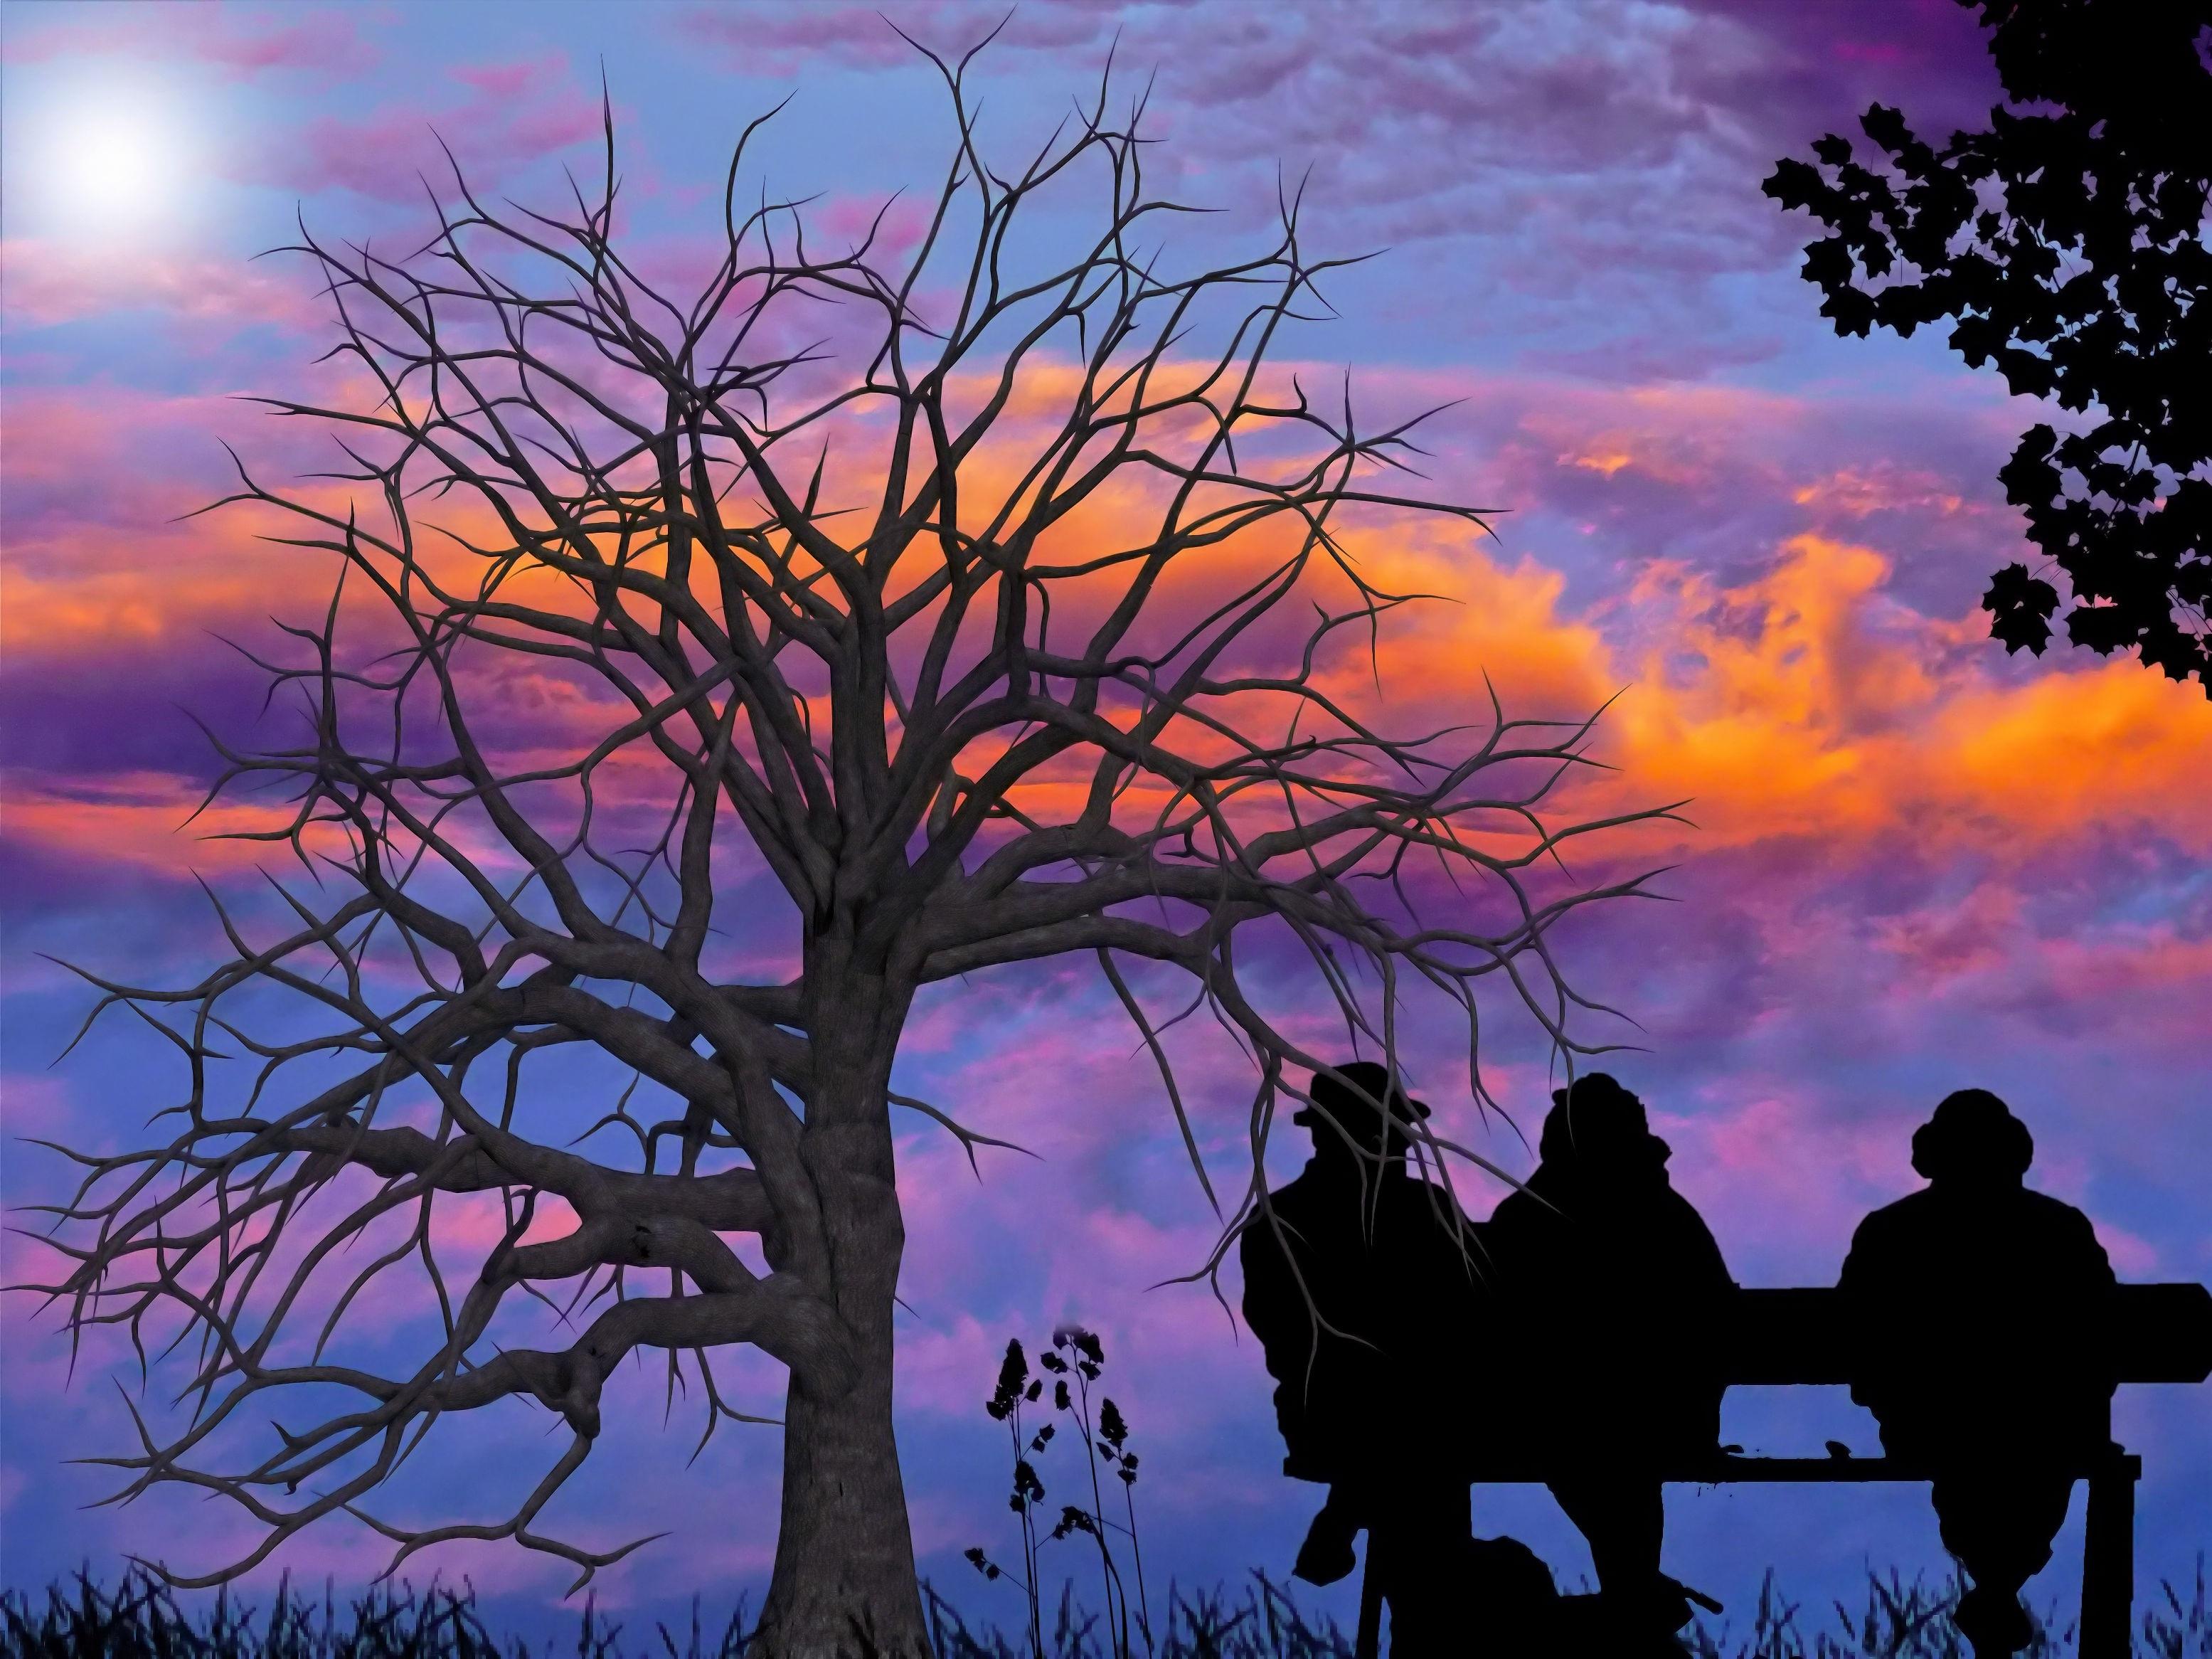 Gratis Afbeeldingen : landschap, boom, tak, silhouet, wolk, mensen ...